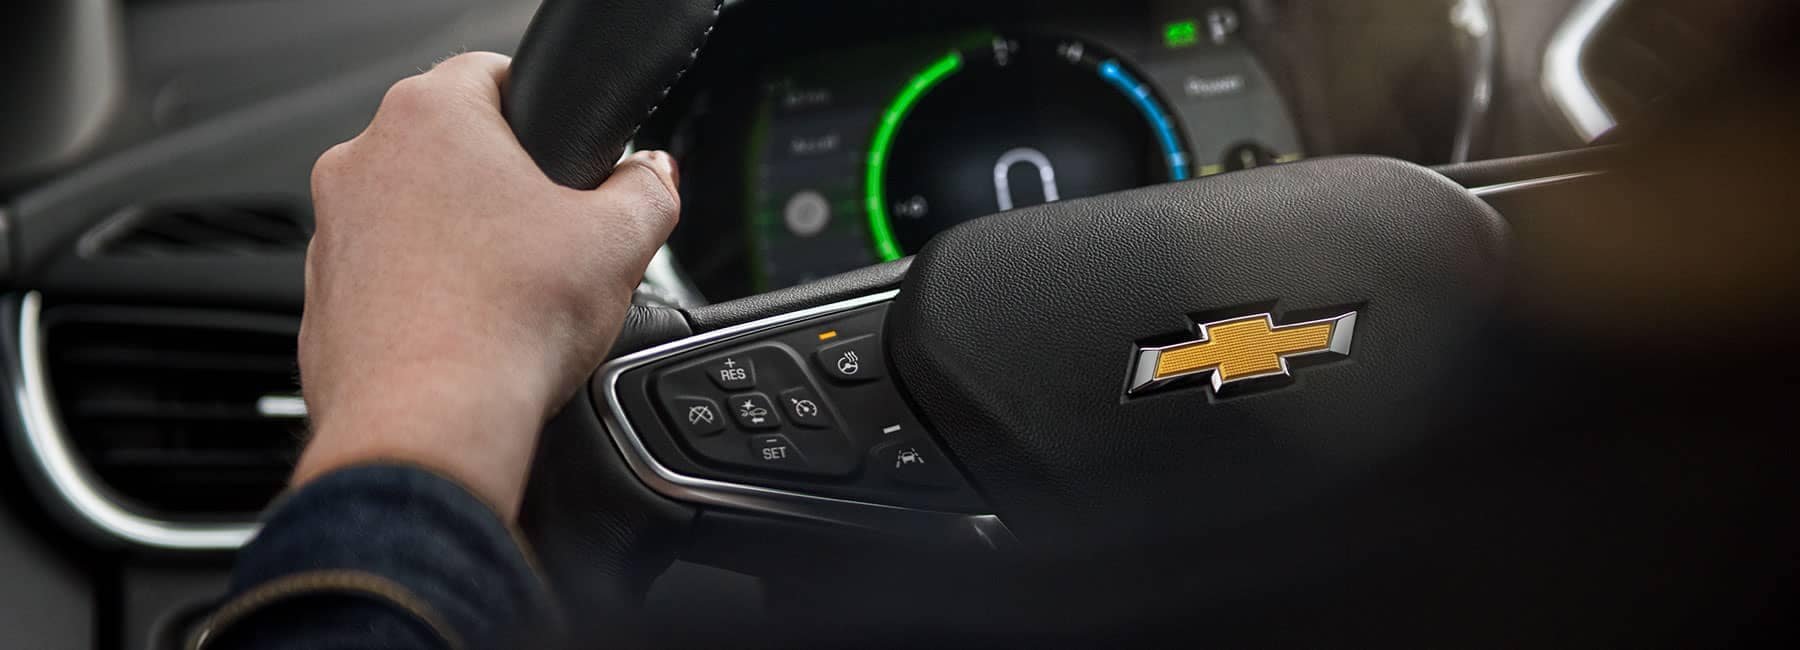 Chevrolet Dashboard